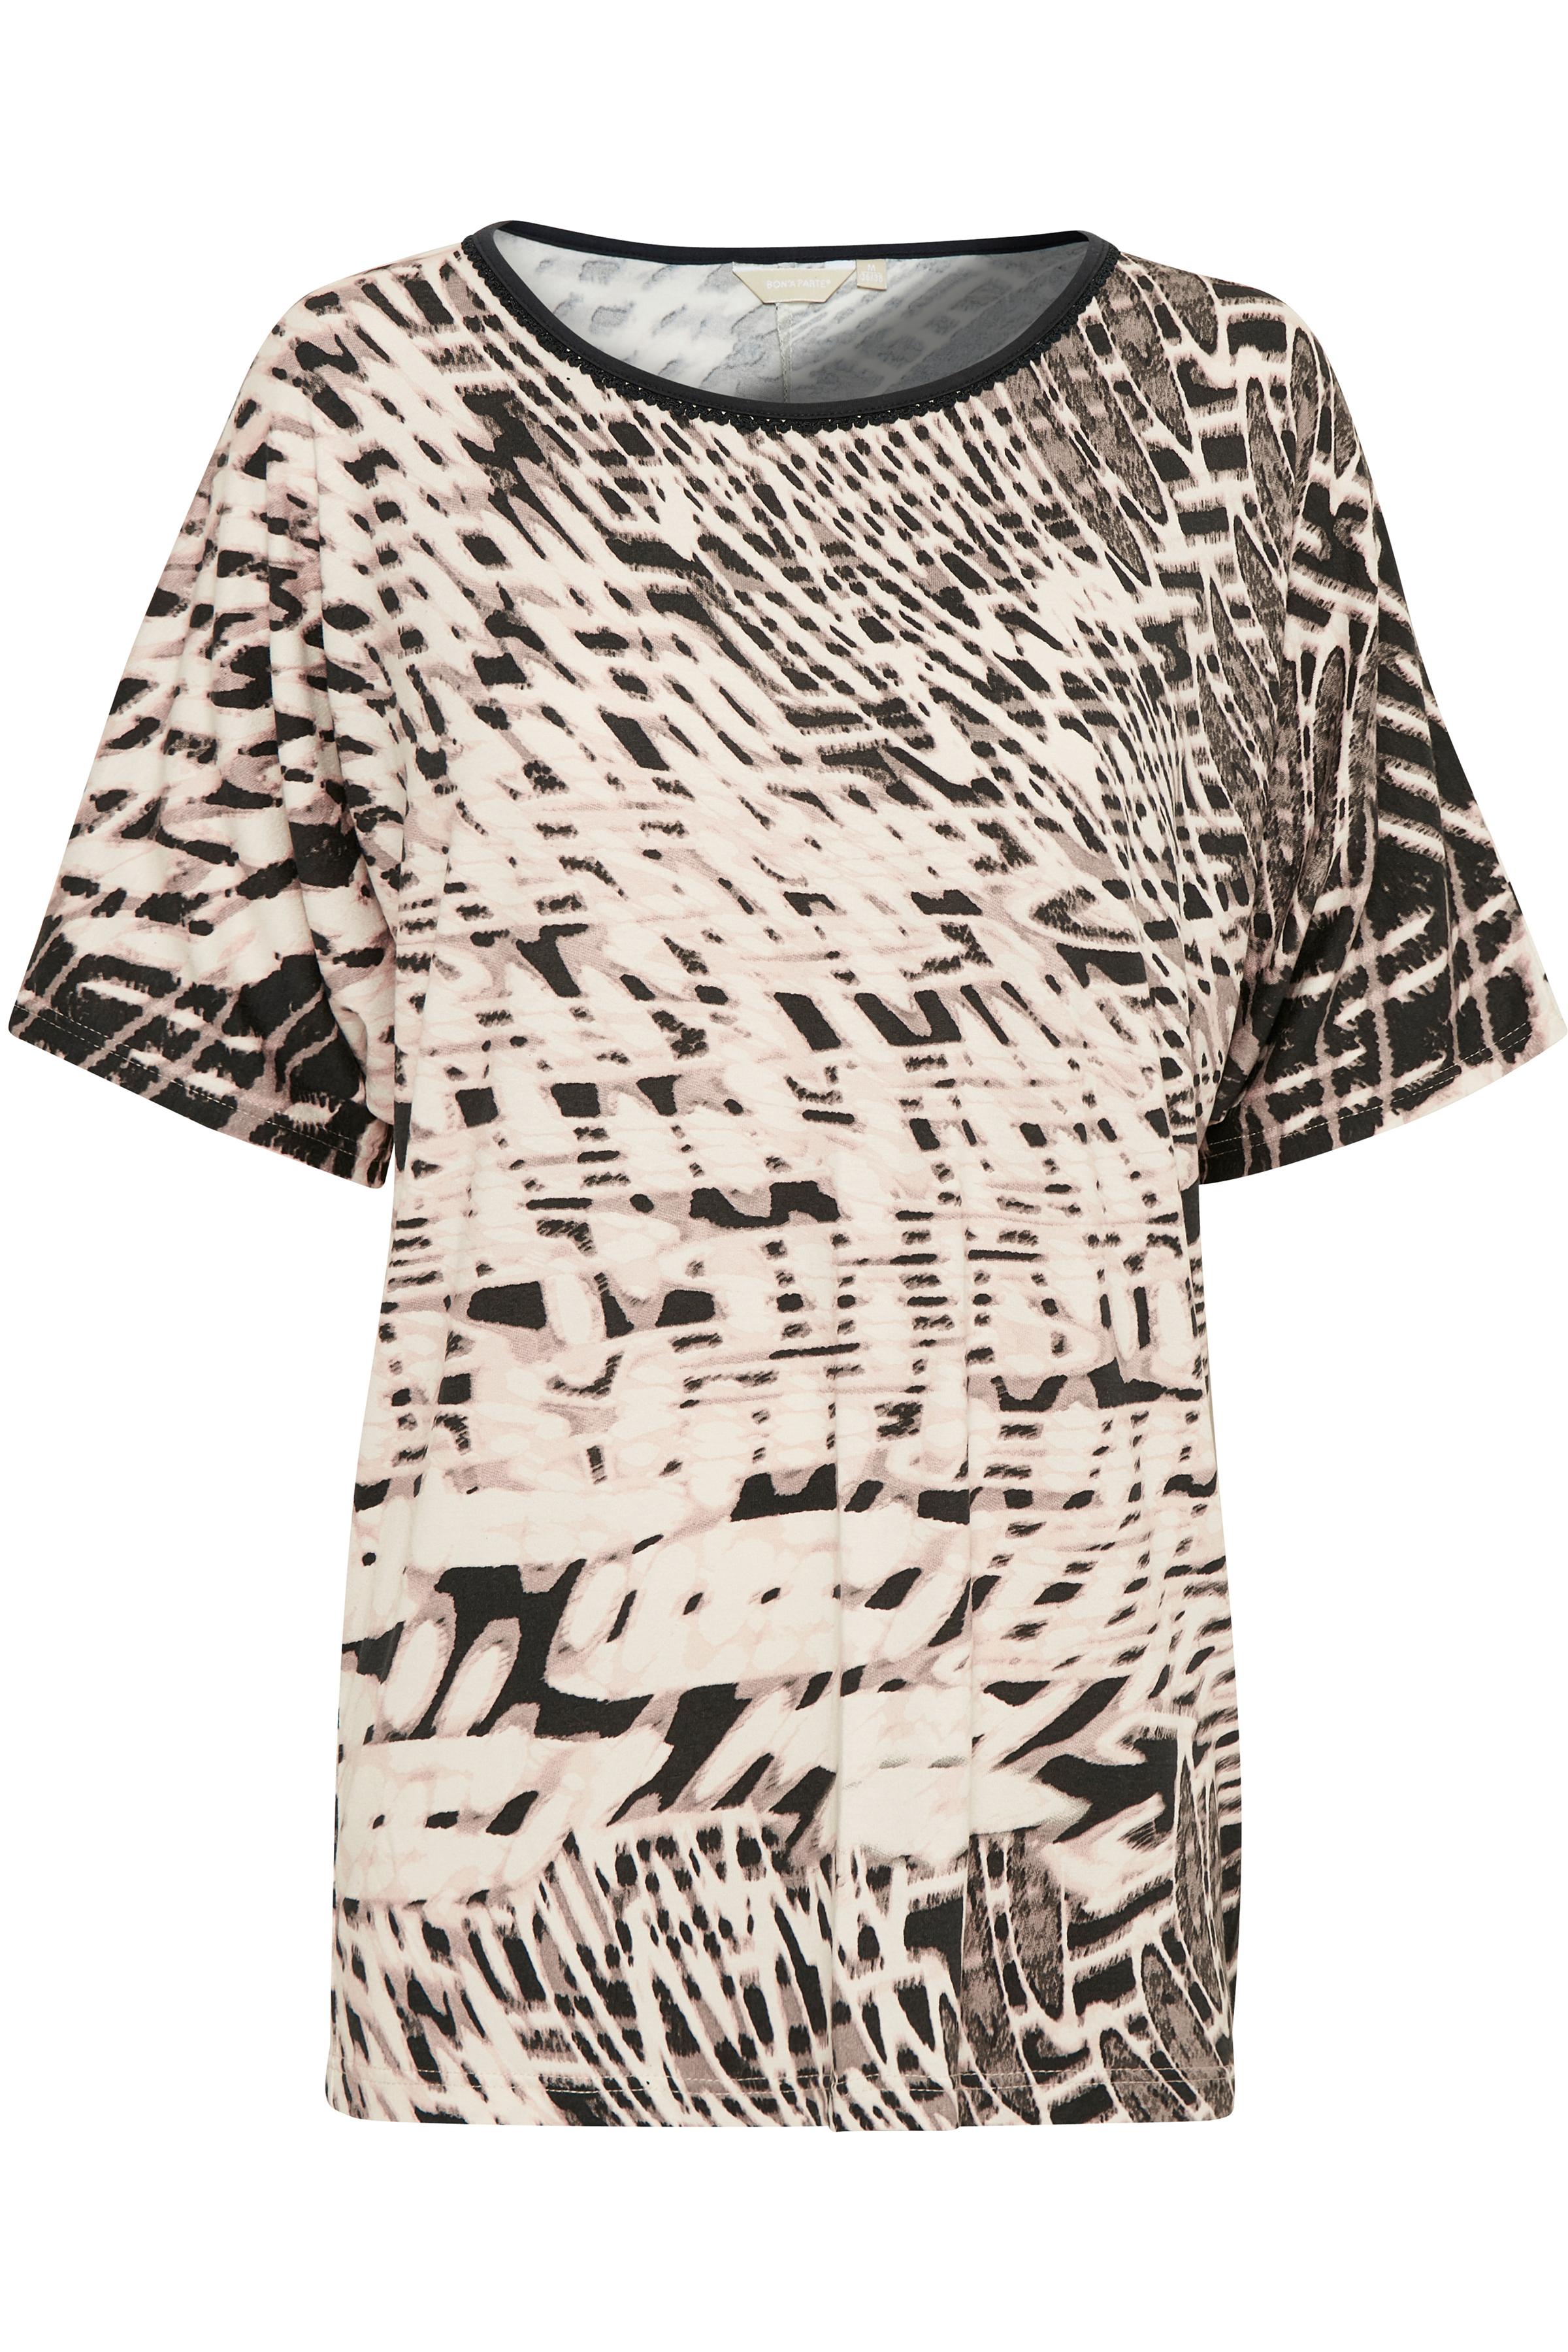 Støvet rosa/grå Kortærmet bluse fra Bon'A Parte – Køb Støvet rosa/grå Kortærmet bluse fra str. S-2XL her